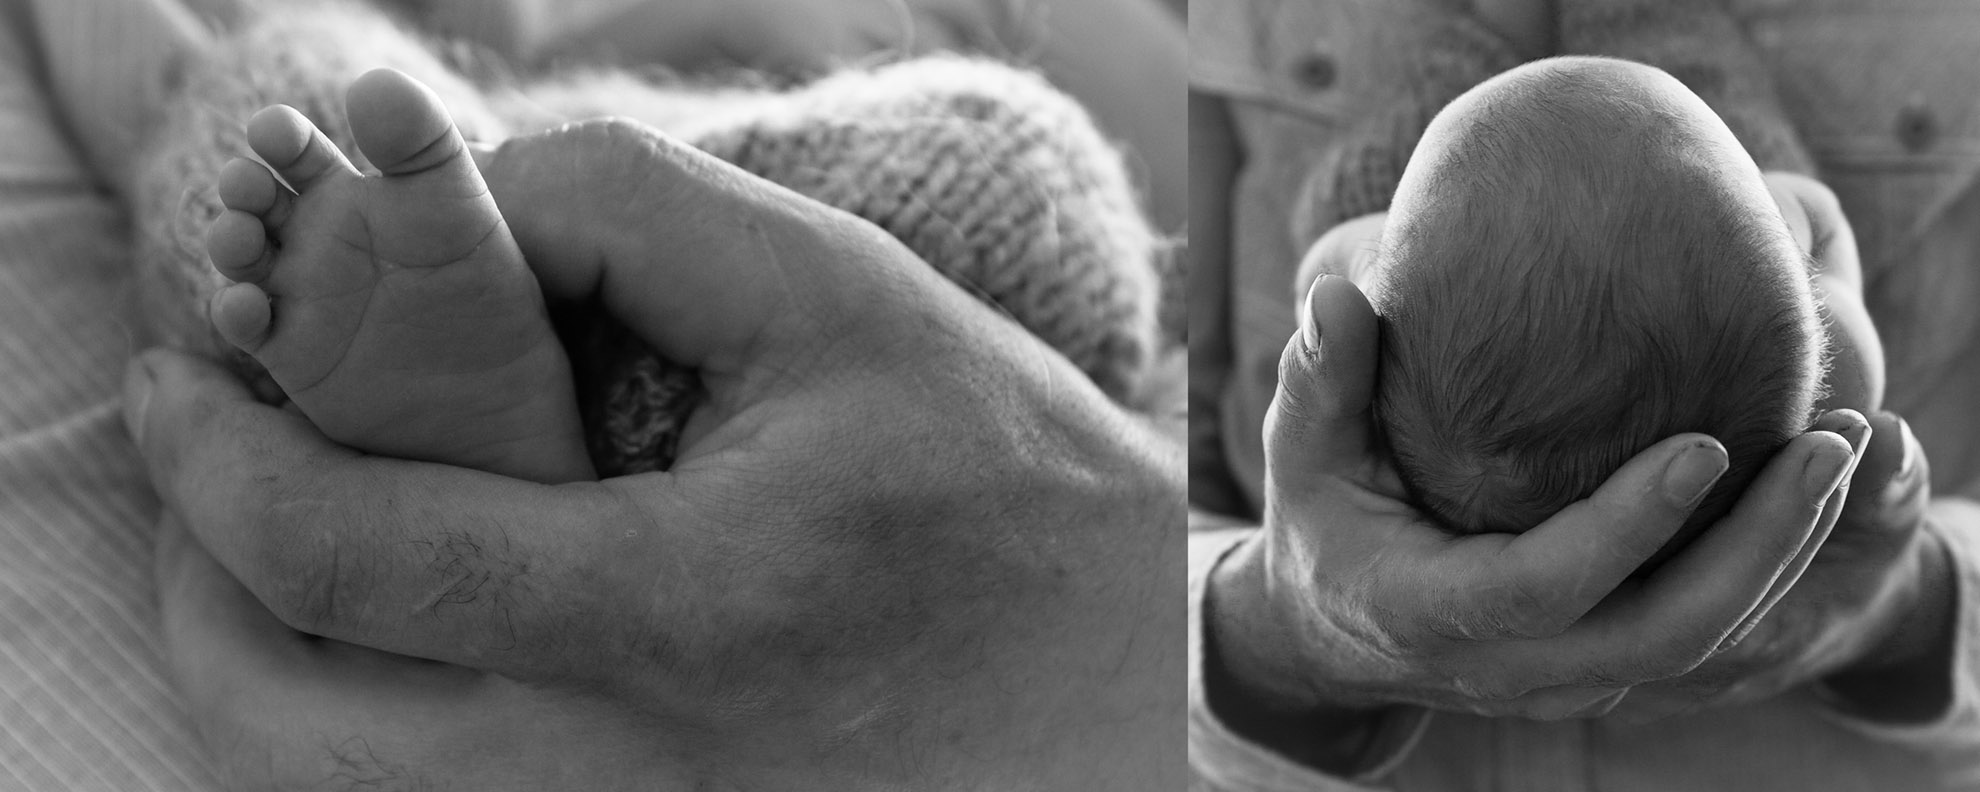 Hamilton-photographer-baby-in-dads-hands.jpg